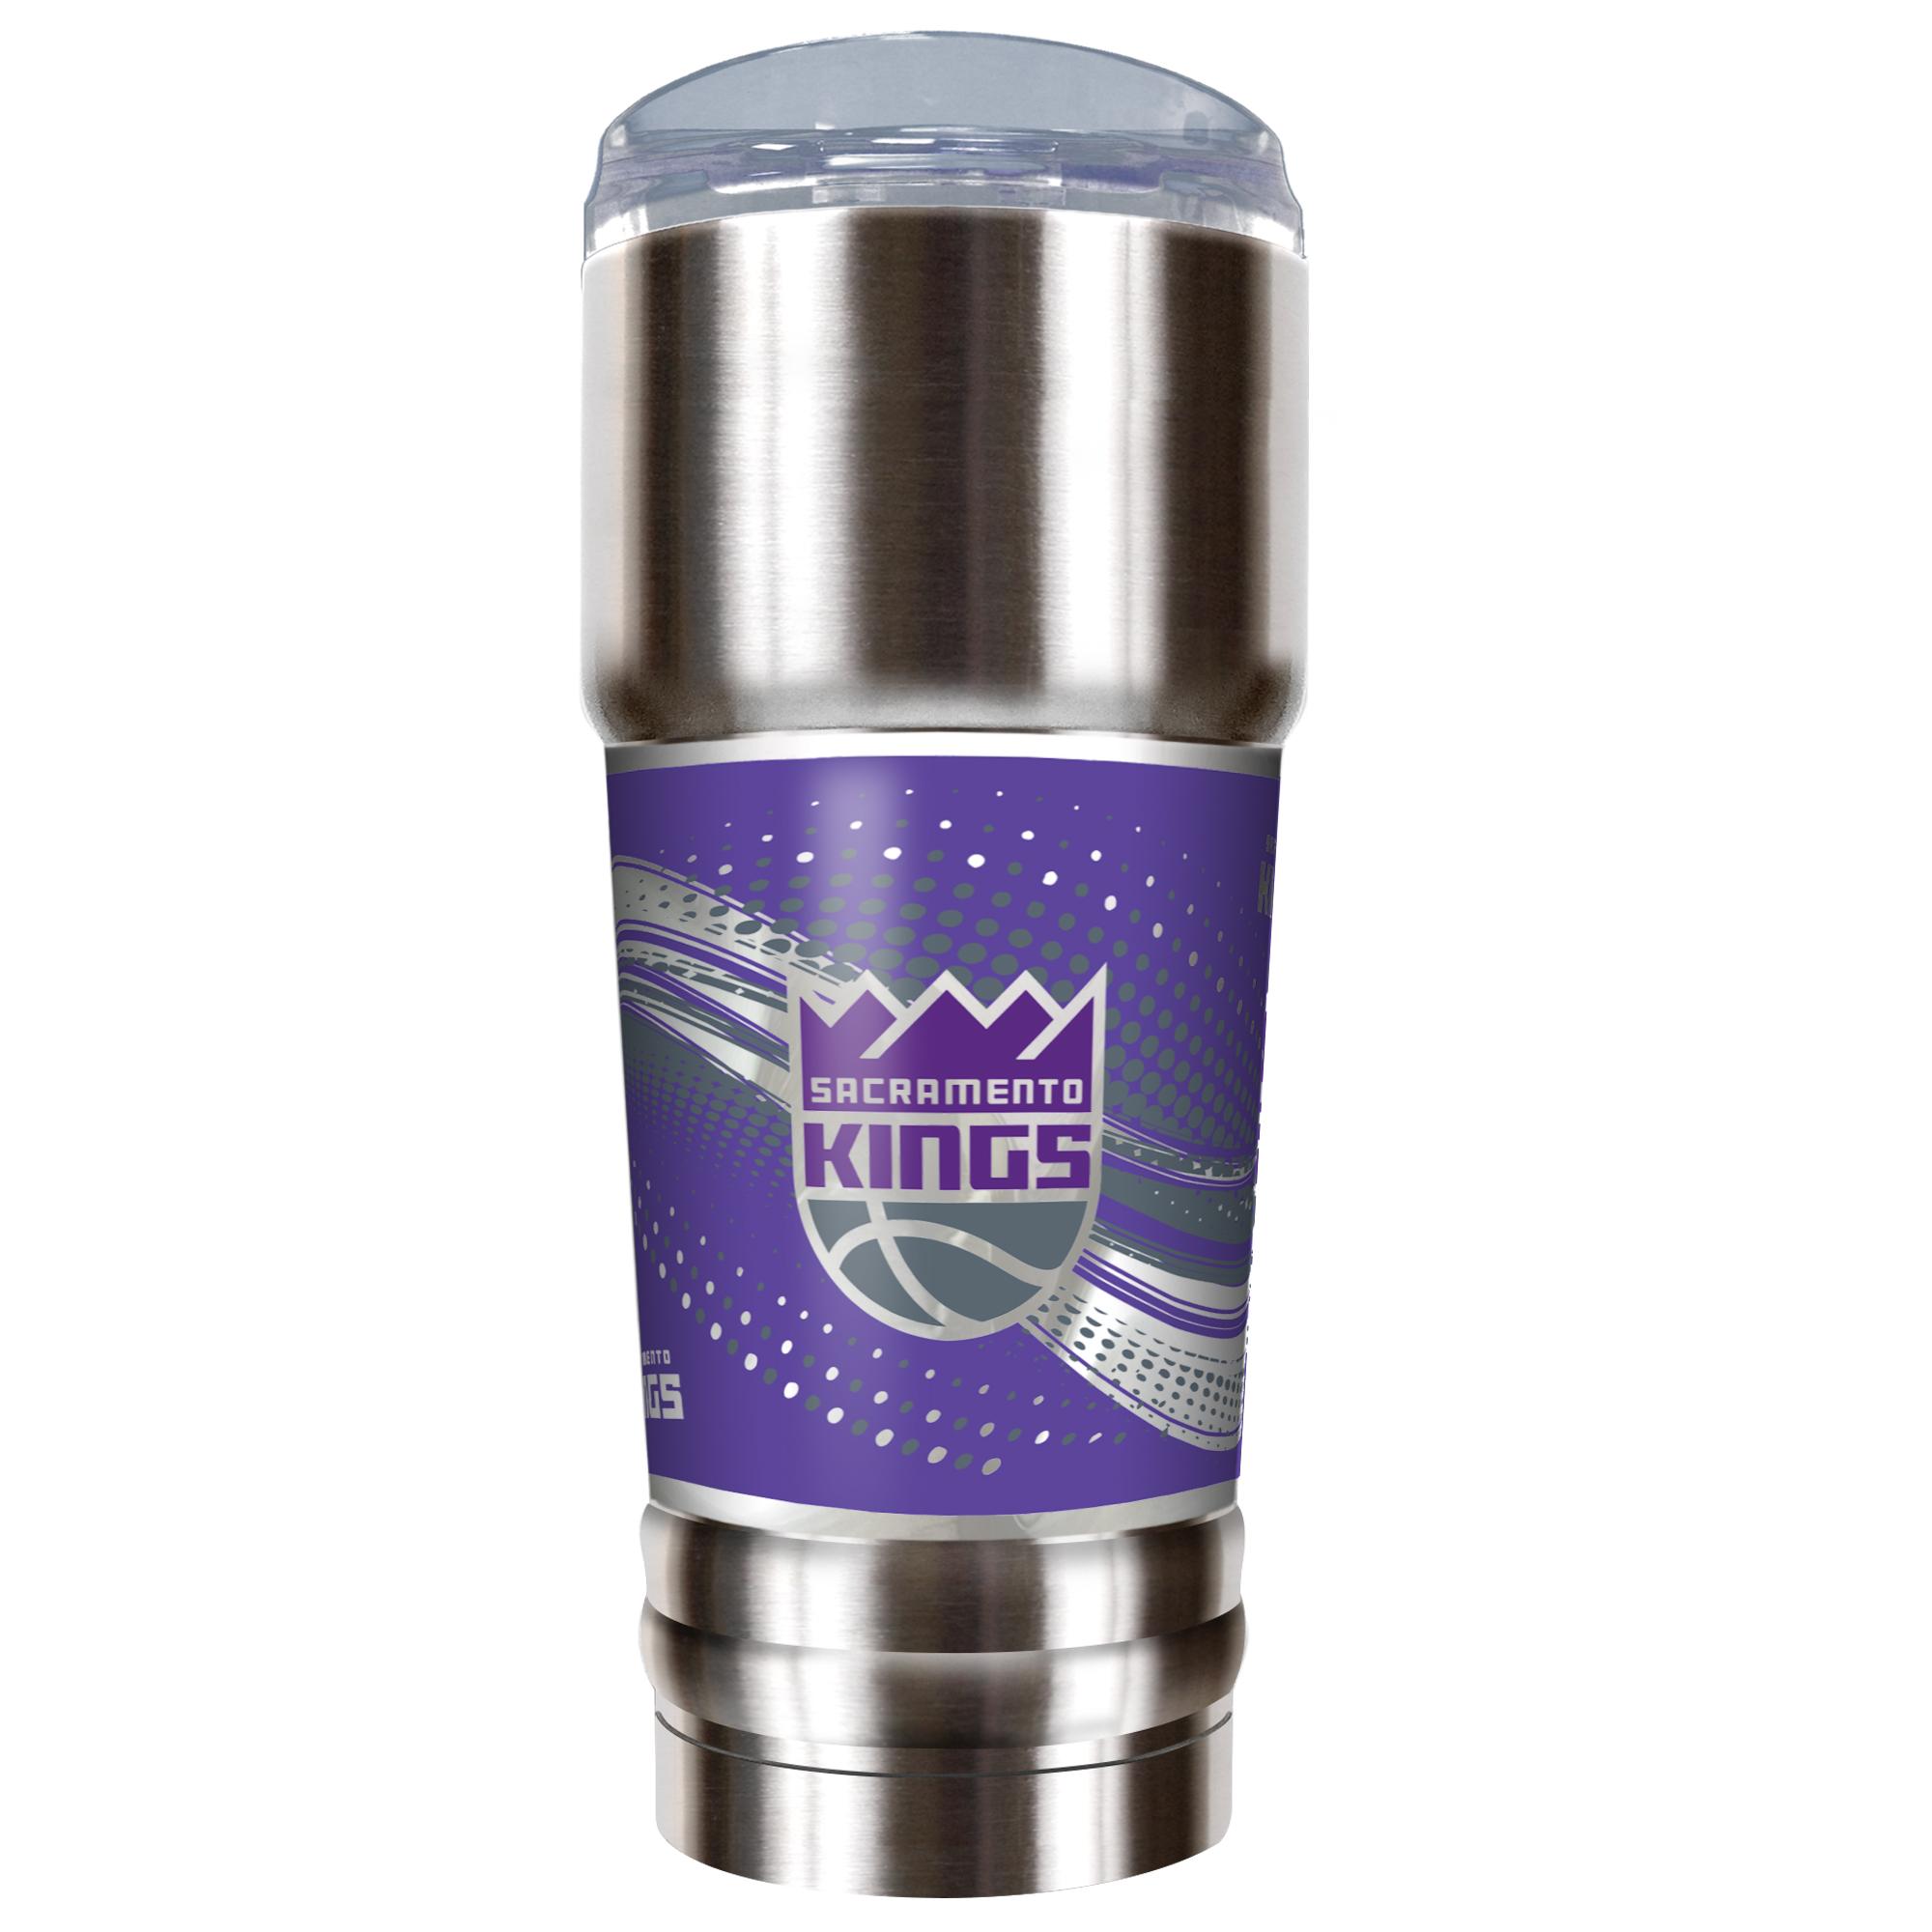 Sacramento Kings 32oz. Pro Tumbler - No Size